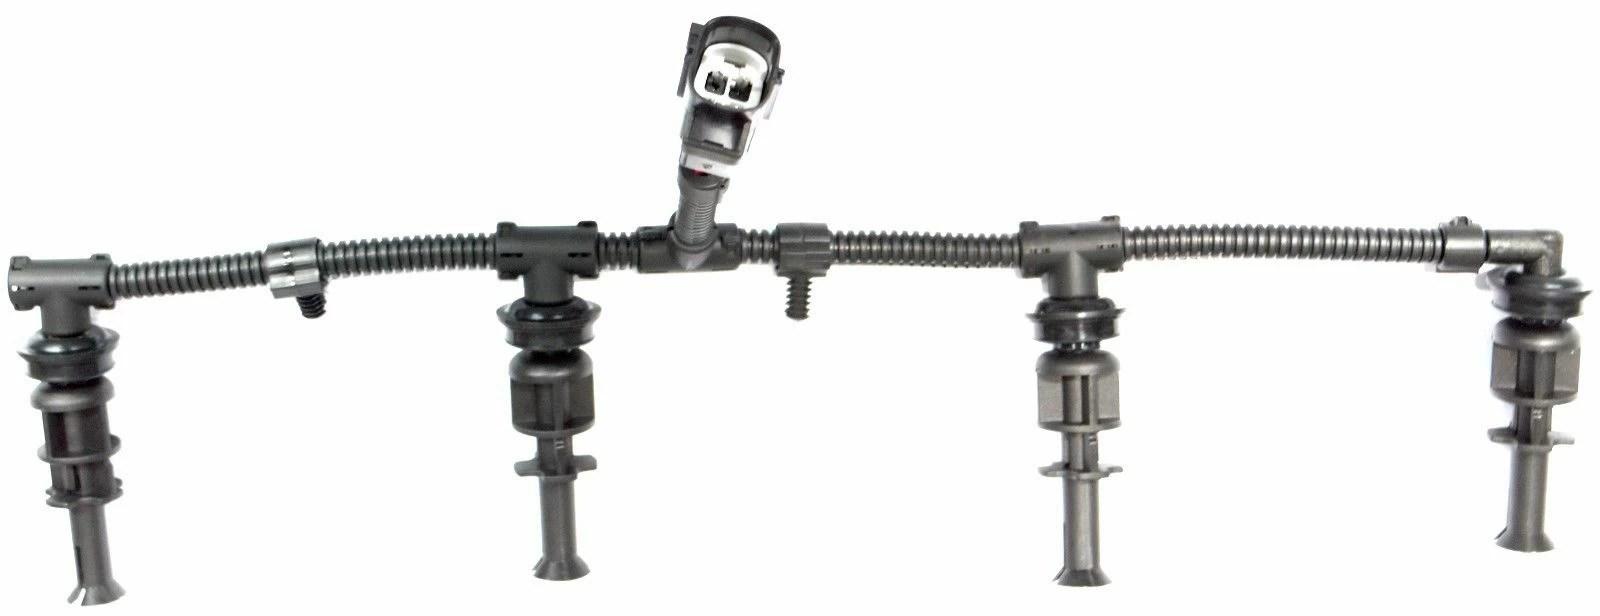 Glow Plug Harness Set for 08-10 6.4L Powerstroke